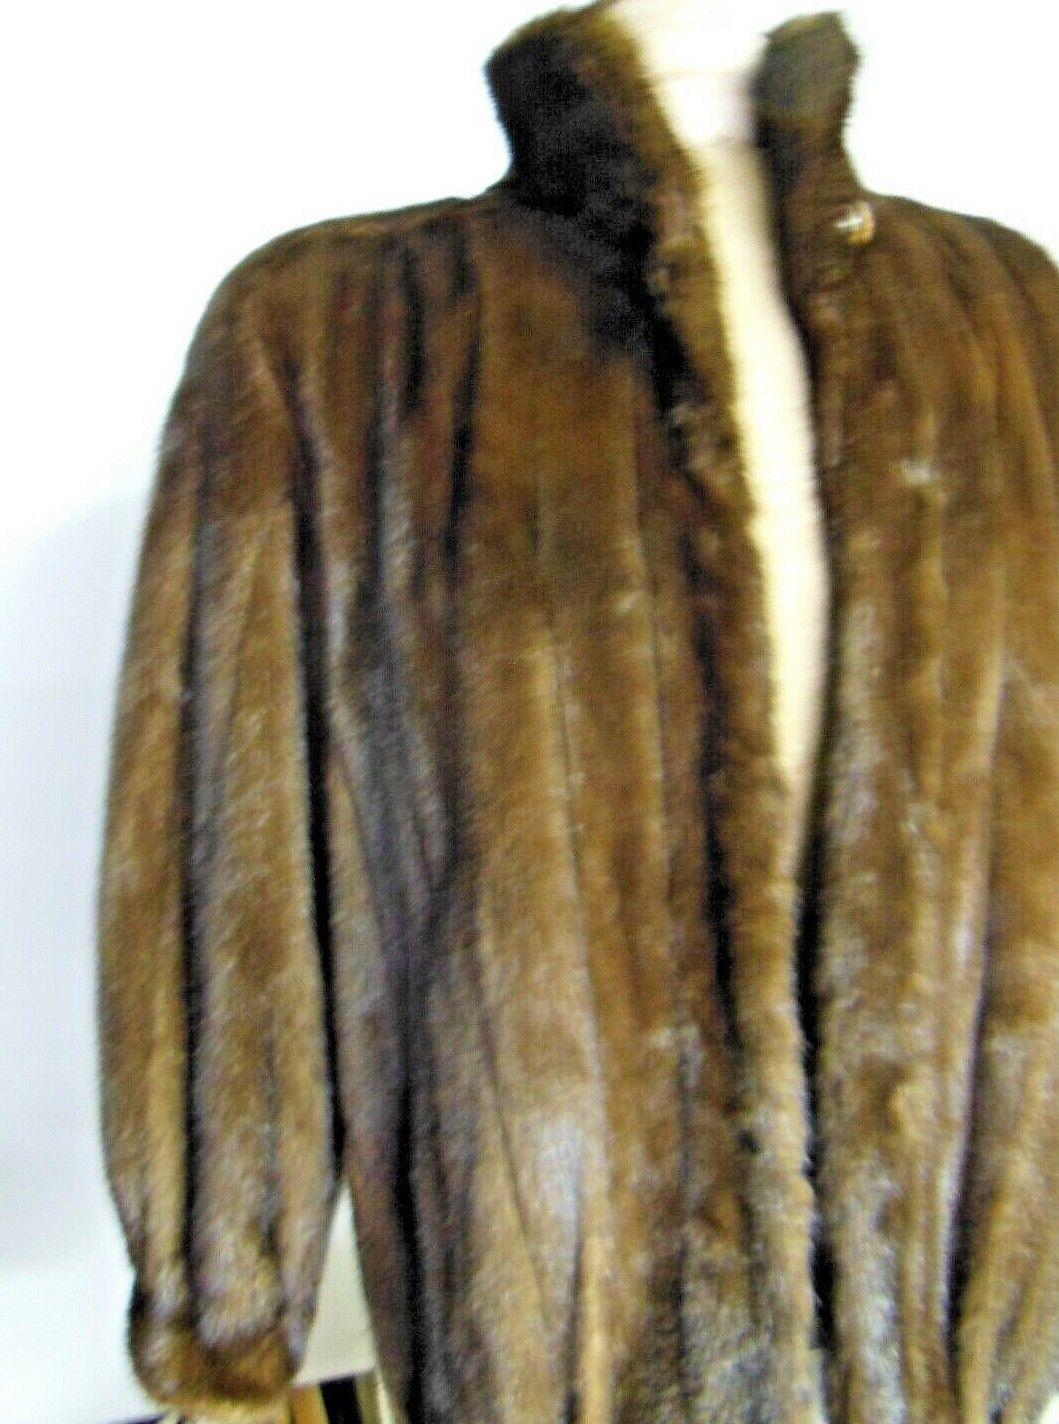 Women's MINK Coat Coat Coat Bomber Style Size S - M - L by Contino  Please Read bcf1c1